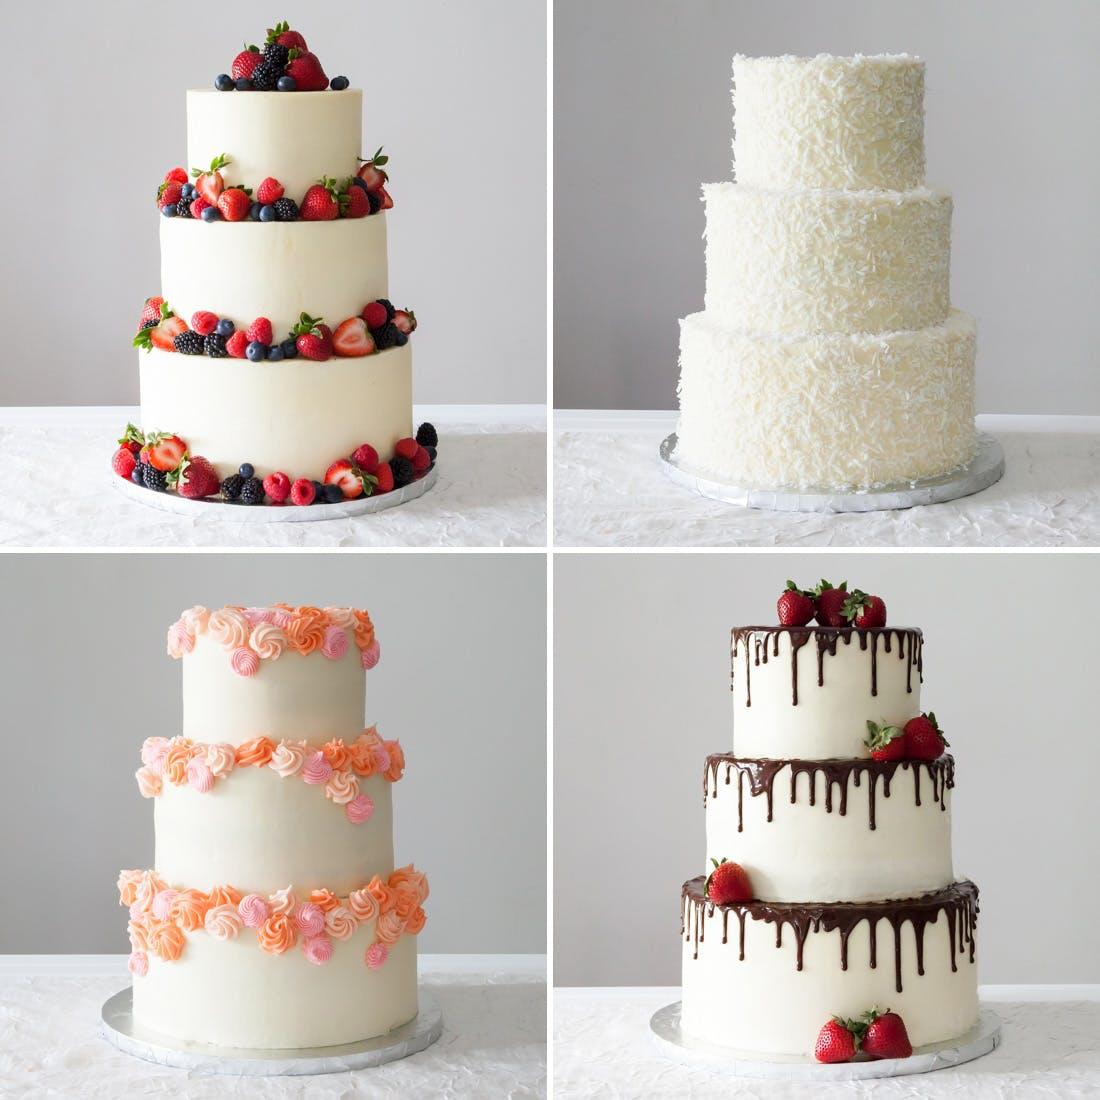 11 Simple DIY Wedding Cupcakes Photo - Homemade Wedding Cake ...